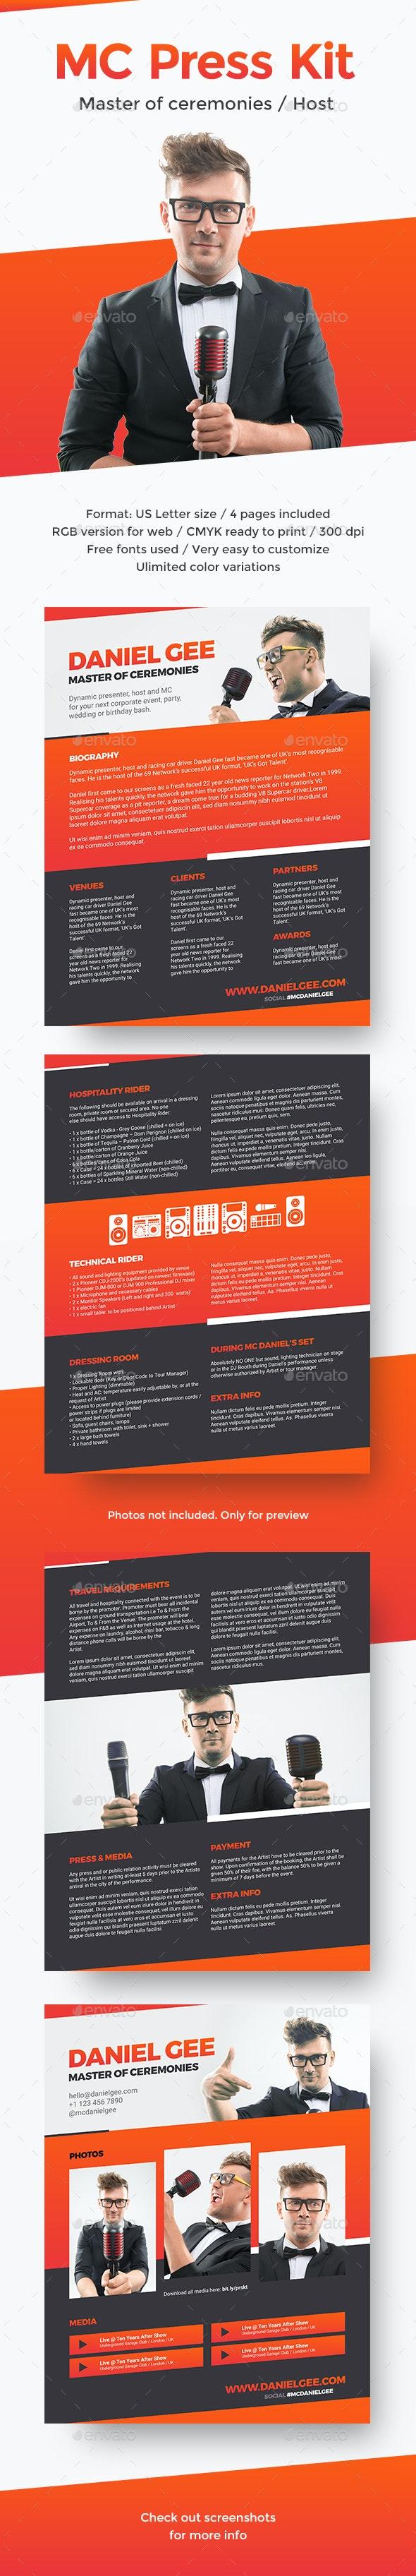 RealMC – Master of Ceremonies / Host Resume / Press Kit PSD Template - Resumes Stationery